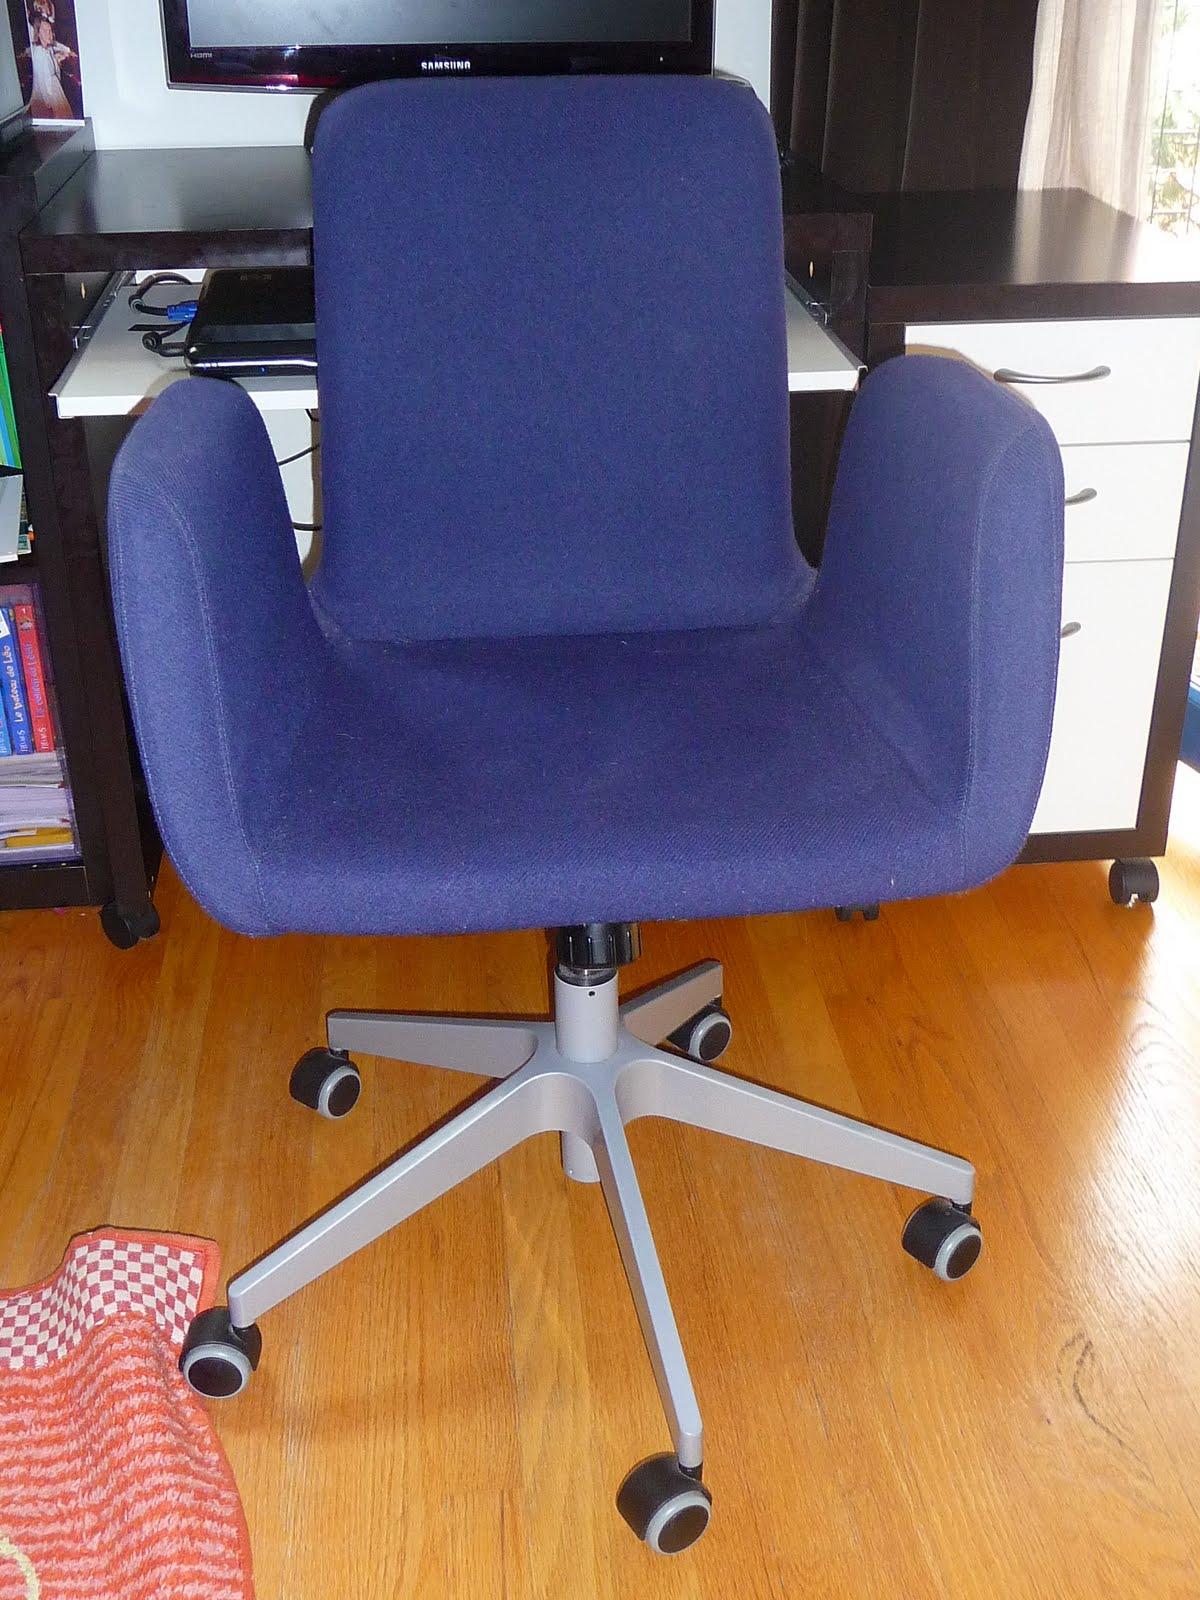 Ikea swivel lounge chair - Swivel Chair Ikea Reference Patrik